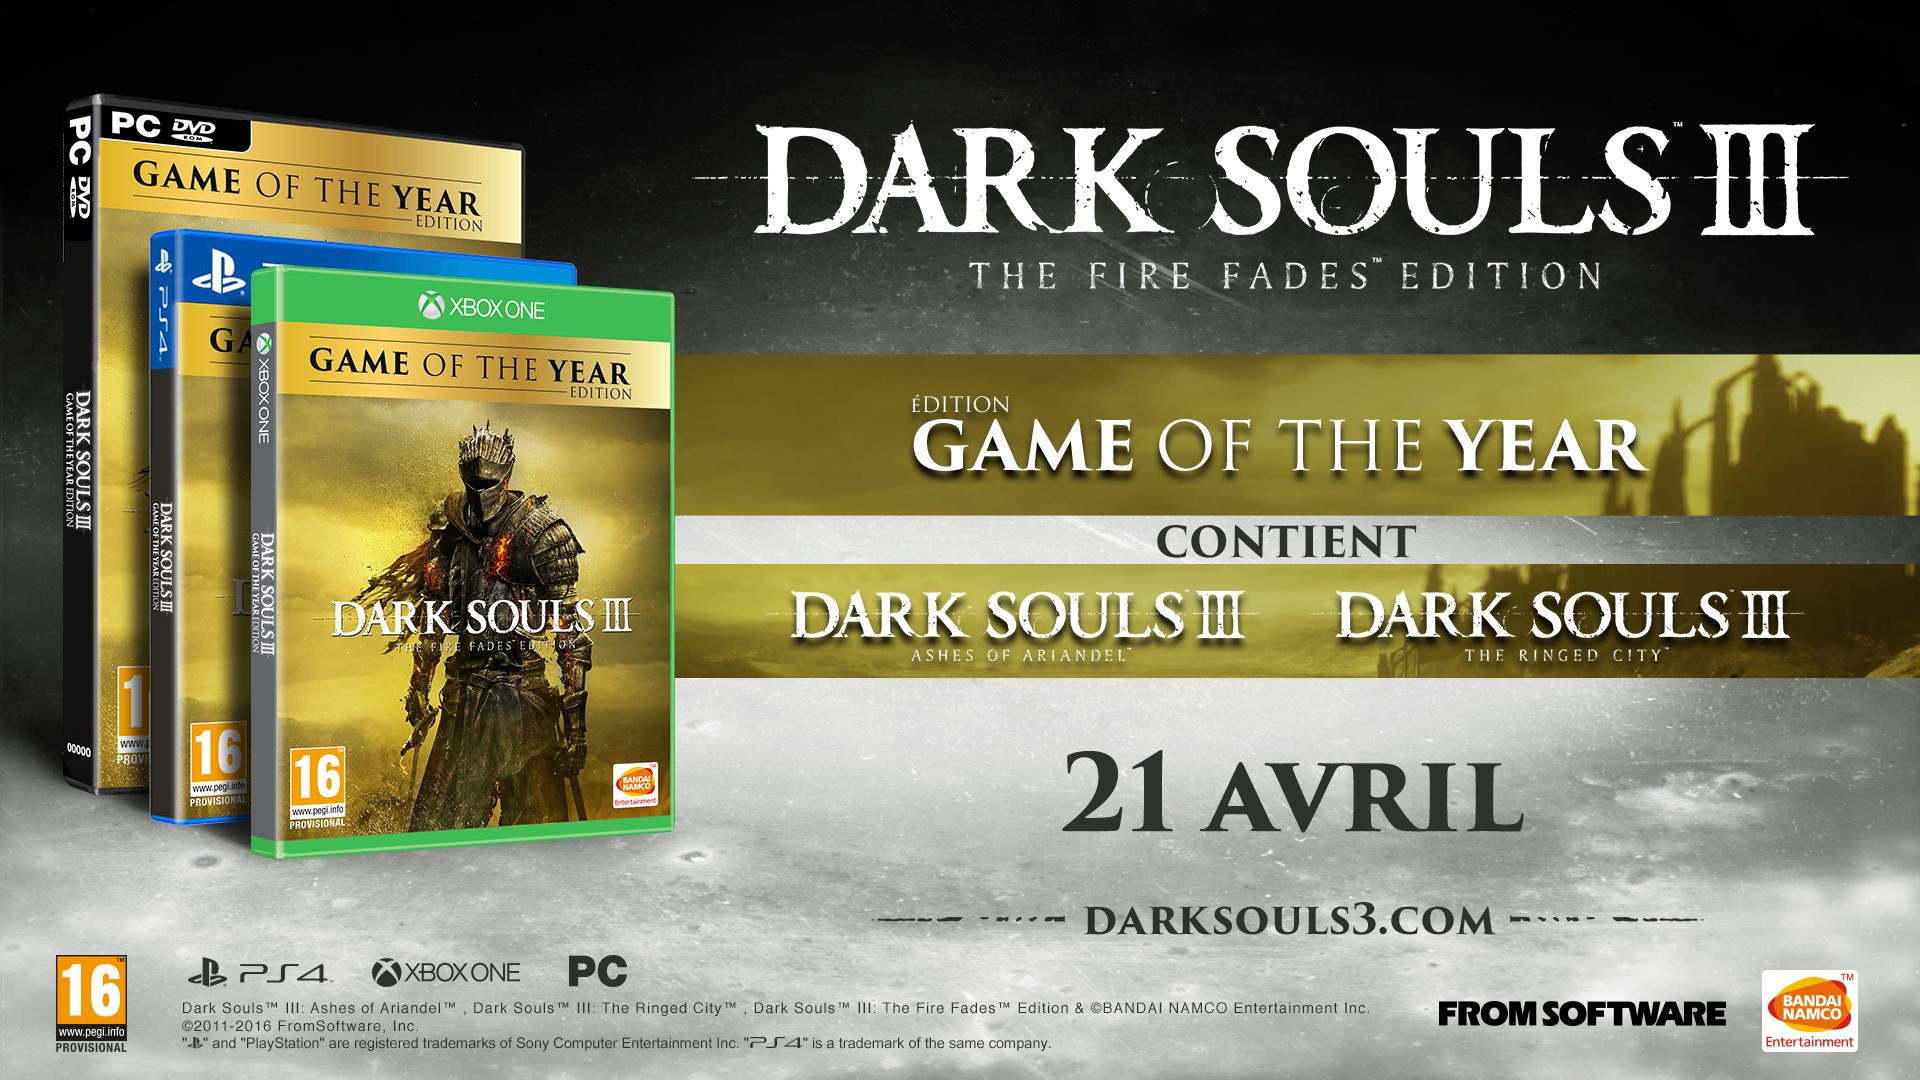 Dark Souls III The Fire Fades